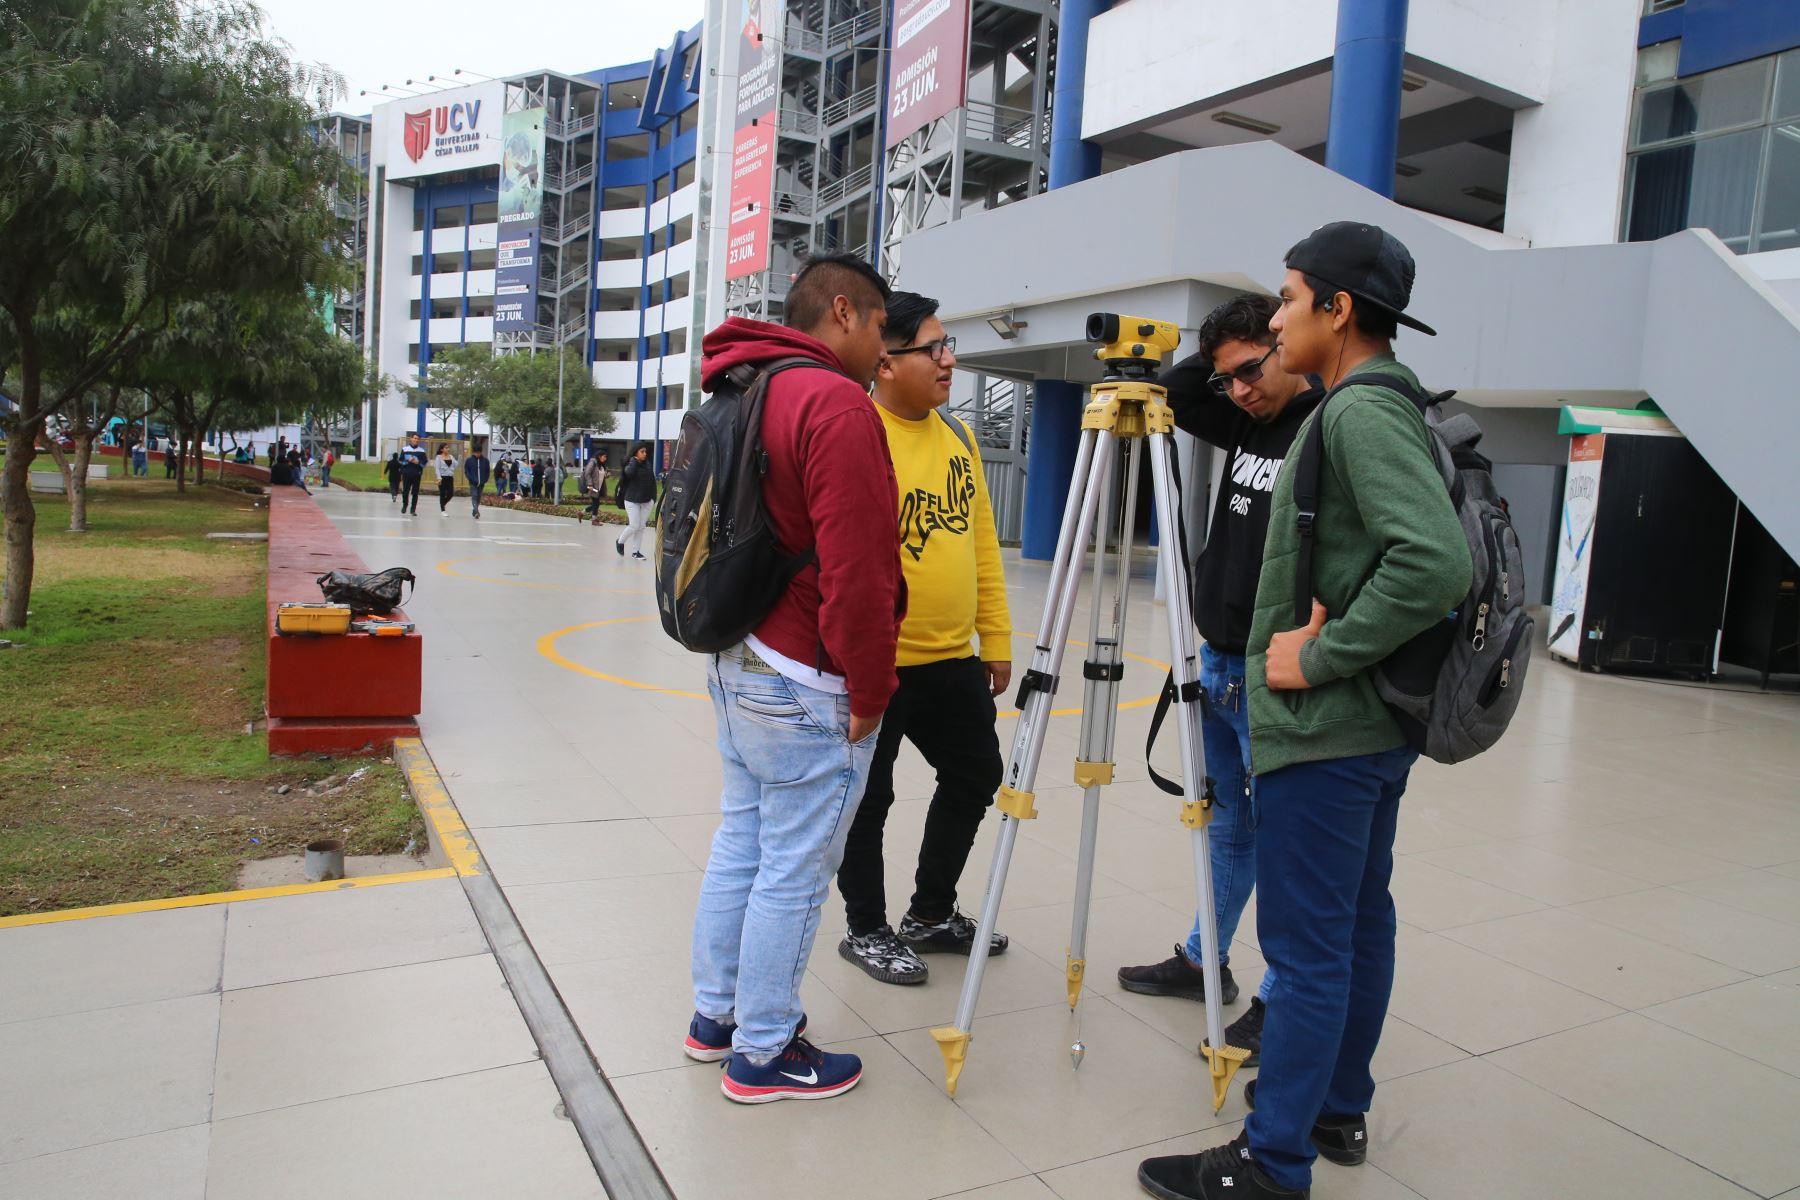 UCV sinceró oferta académica e incrementó docentes calificados. Foto: ANDINA/Vidal TarquiANDINA/Vidal Tarqui